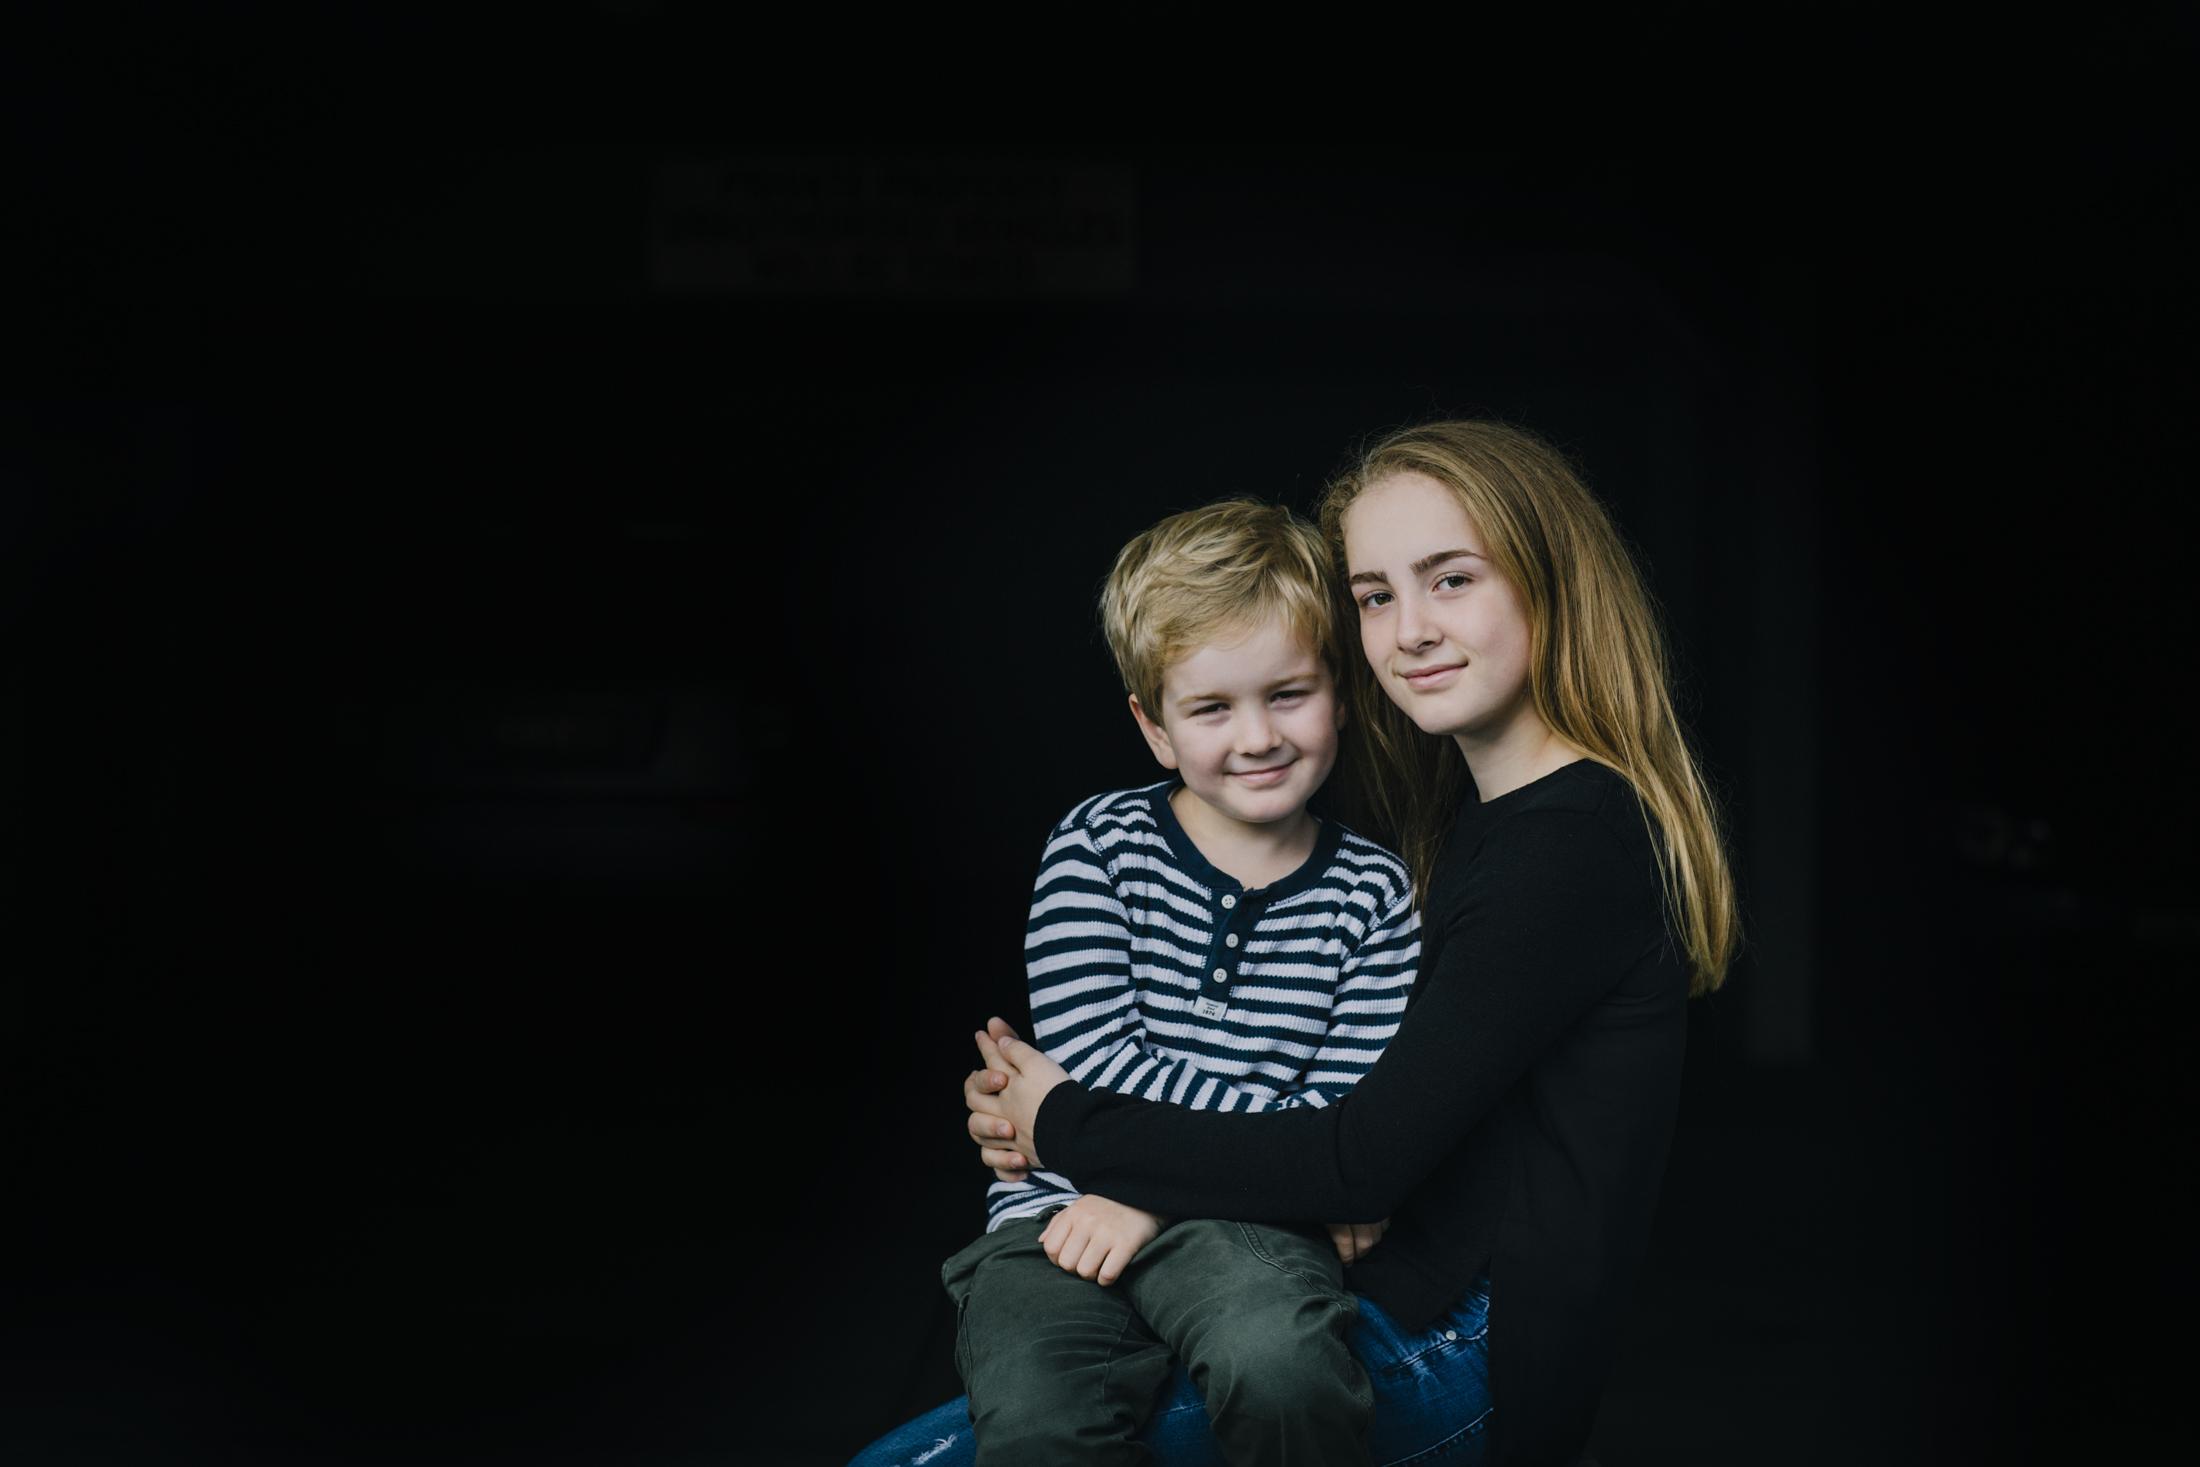 mark_taylor_sydney_family_photography_morffew-15.jpg